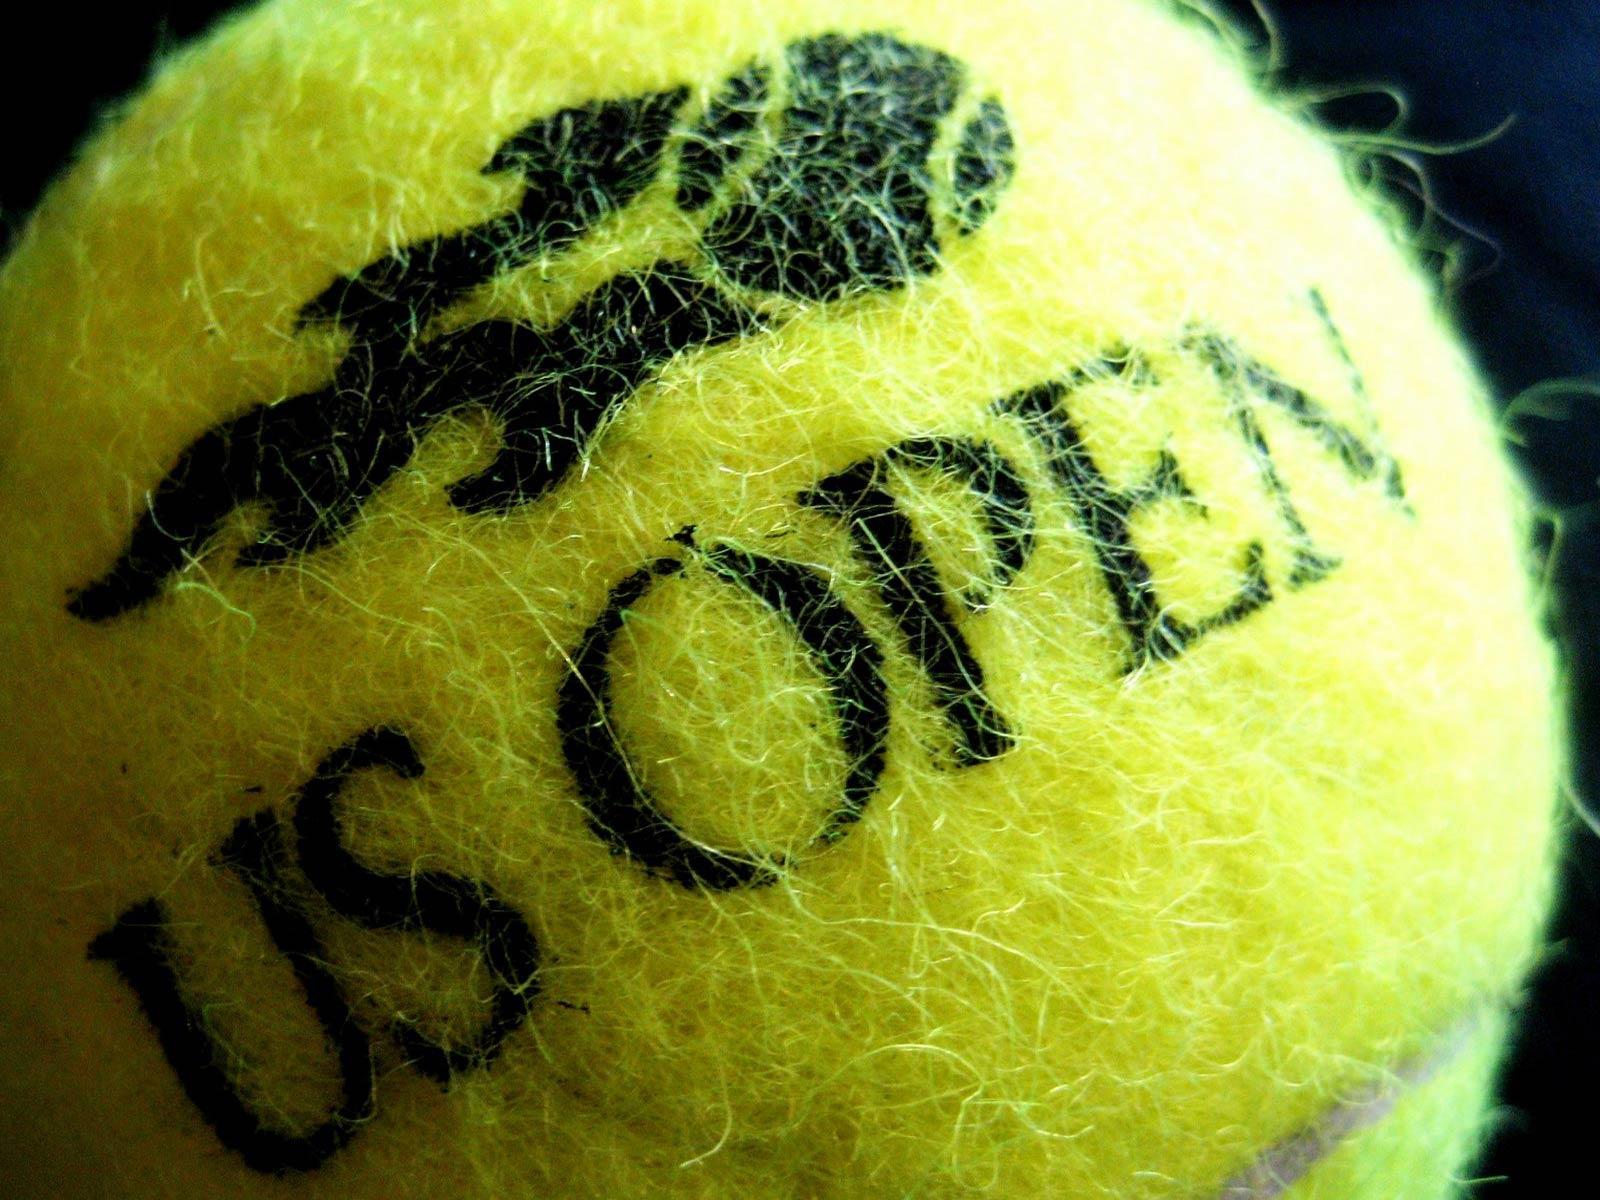 Head Tennis Wallpaper 2012 us Open Tennis Tickets